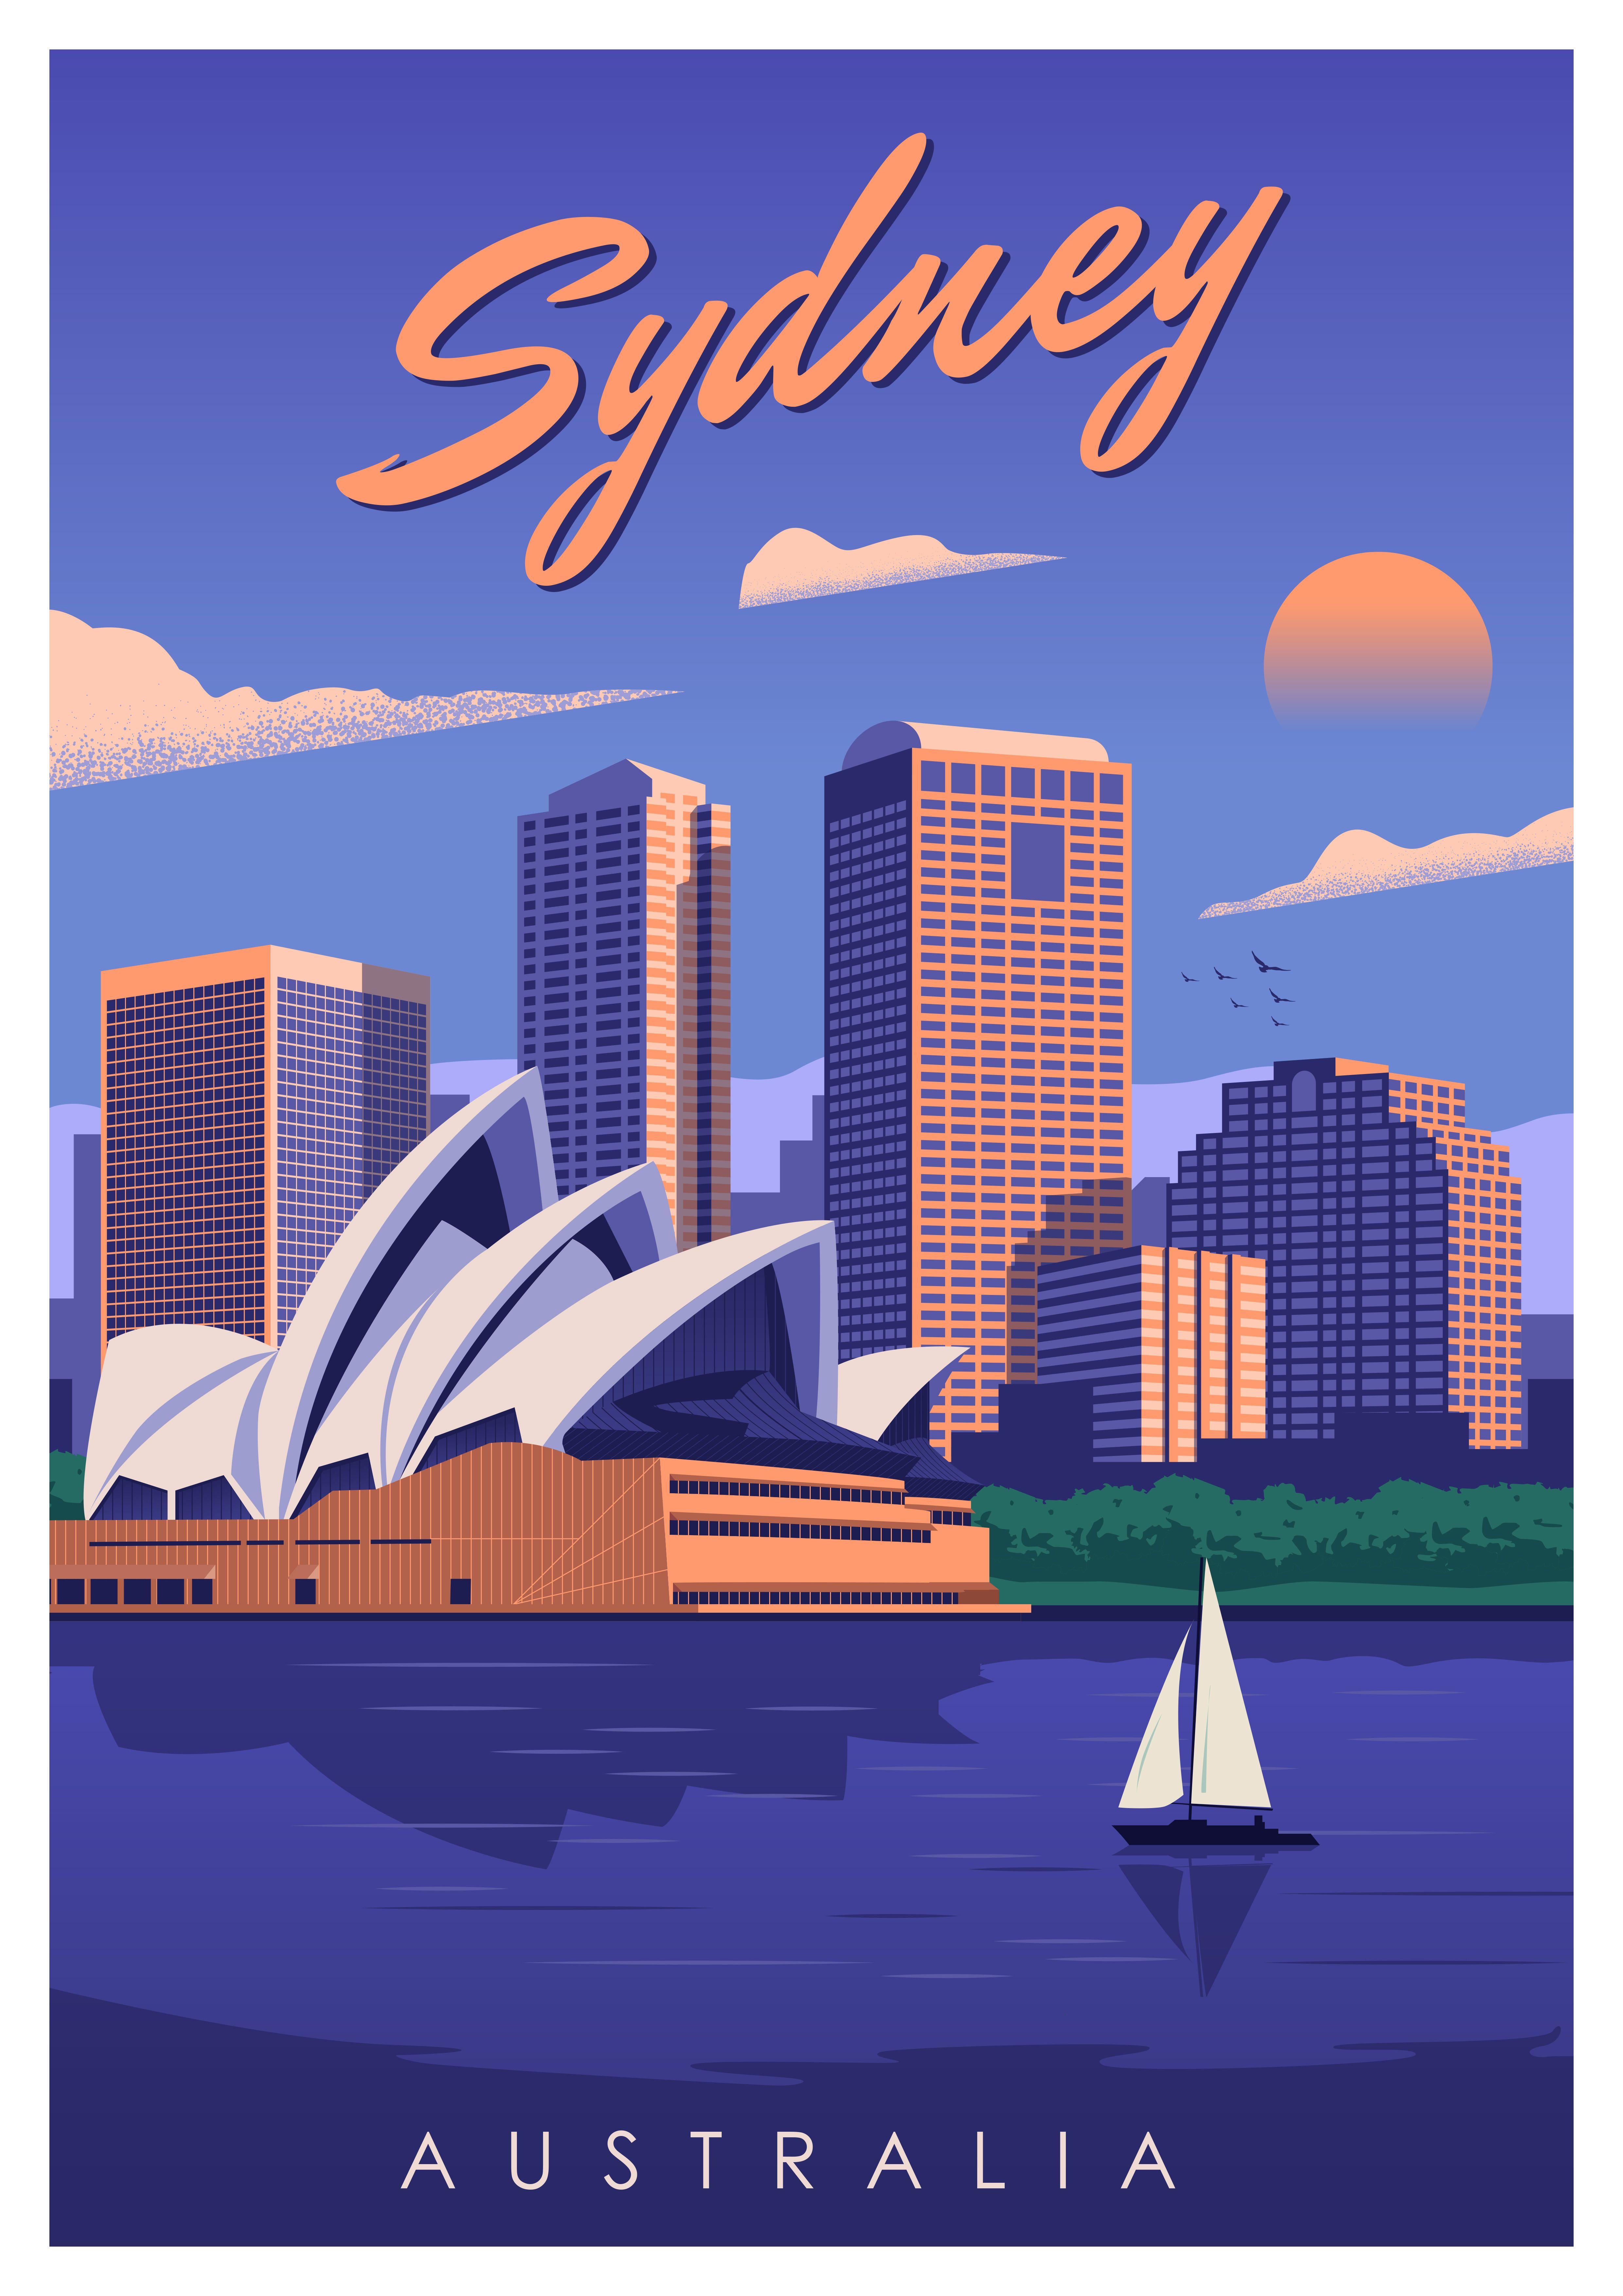 Pin by NickVectorStudio on Original Travel Posters